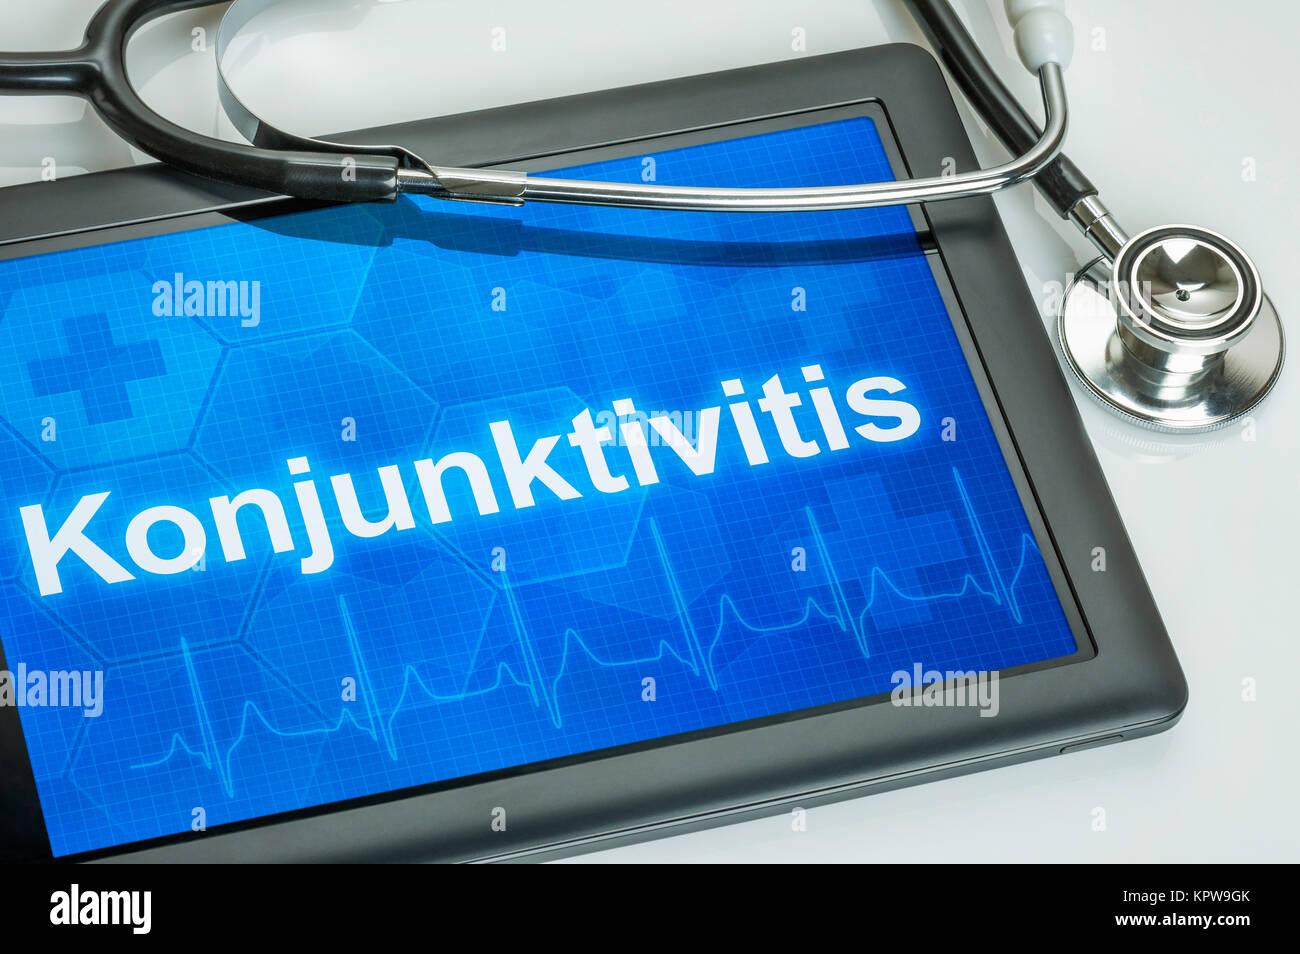 Tablet mit der Diagnose Konjunktivitis auf dem Display Stock Photo